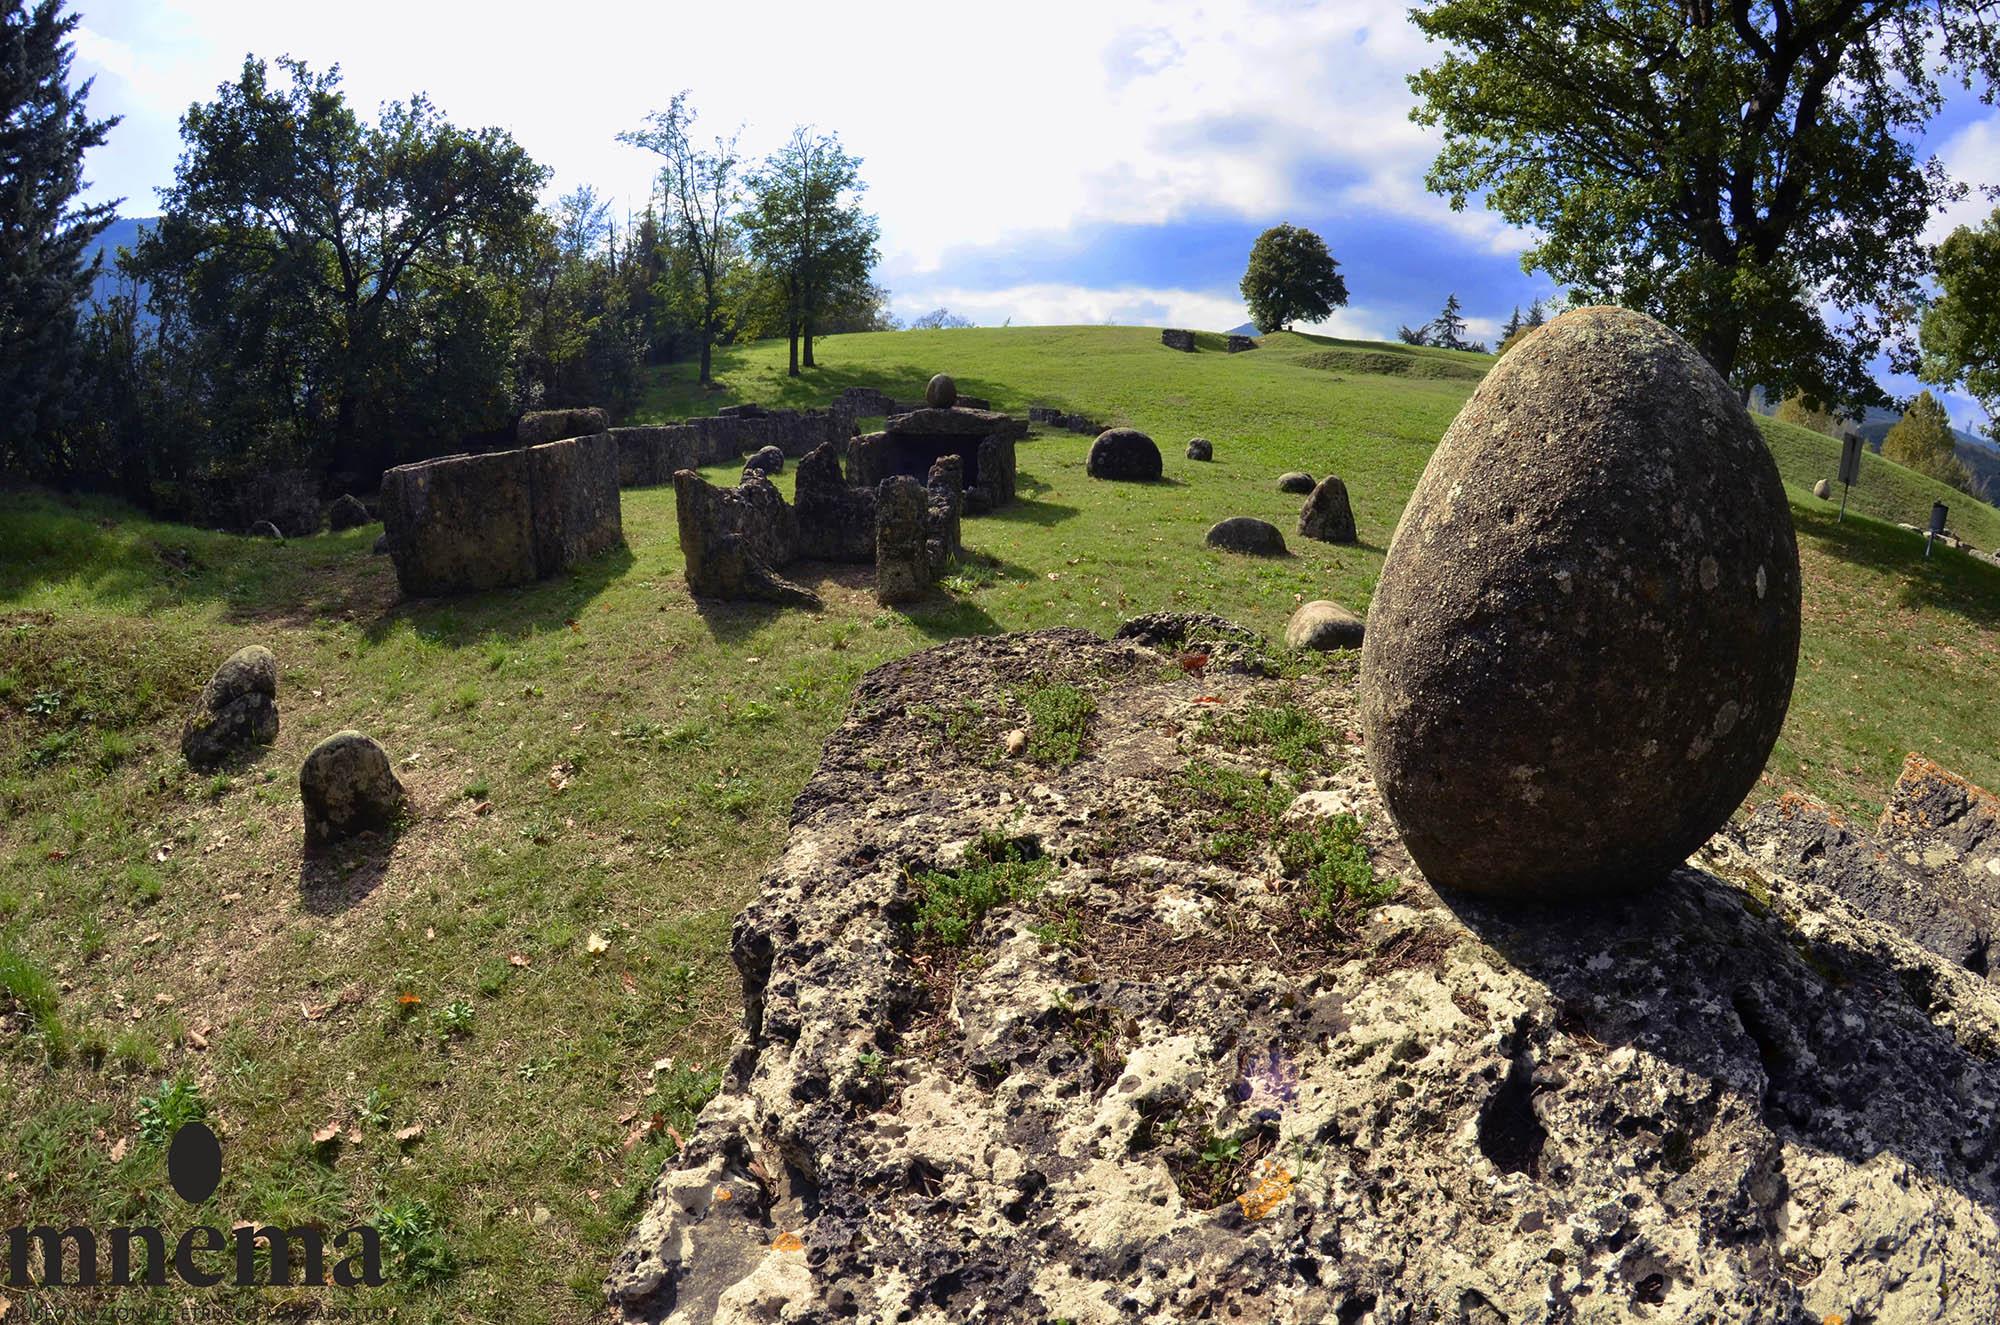 Apertura prolungata e visite accompagnate all'area archeologica di Kainua - Marzabotto